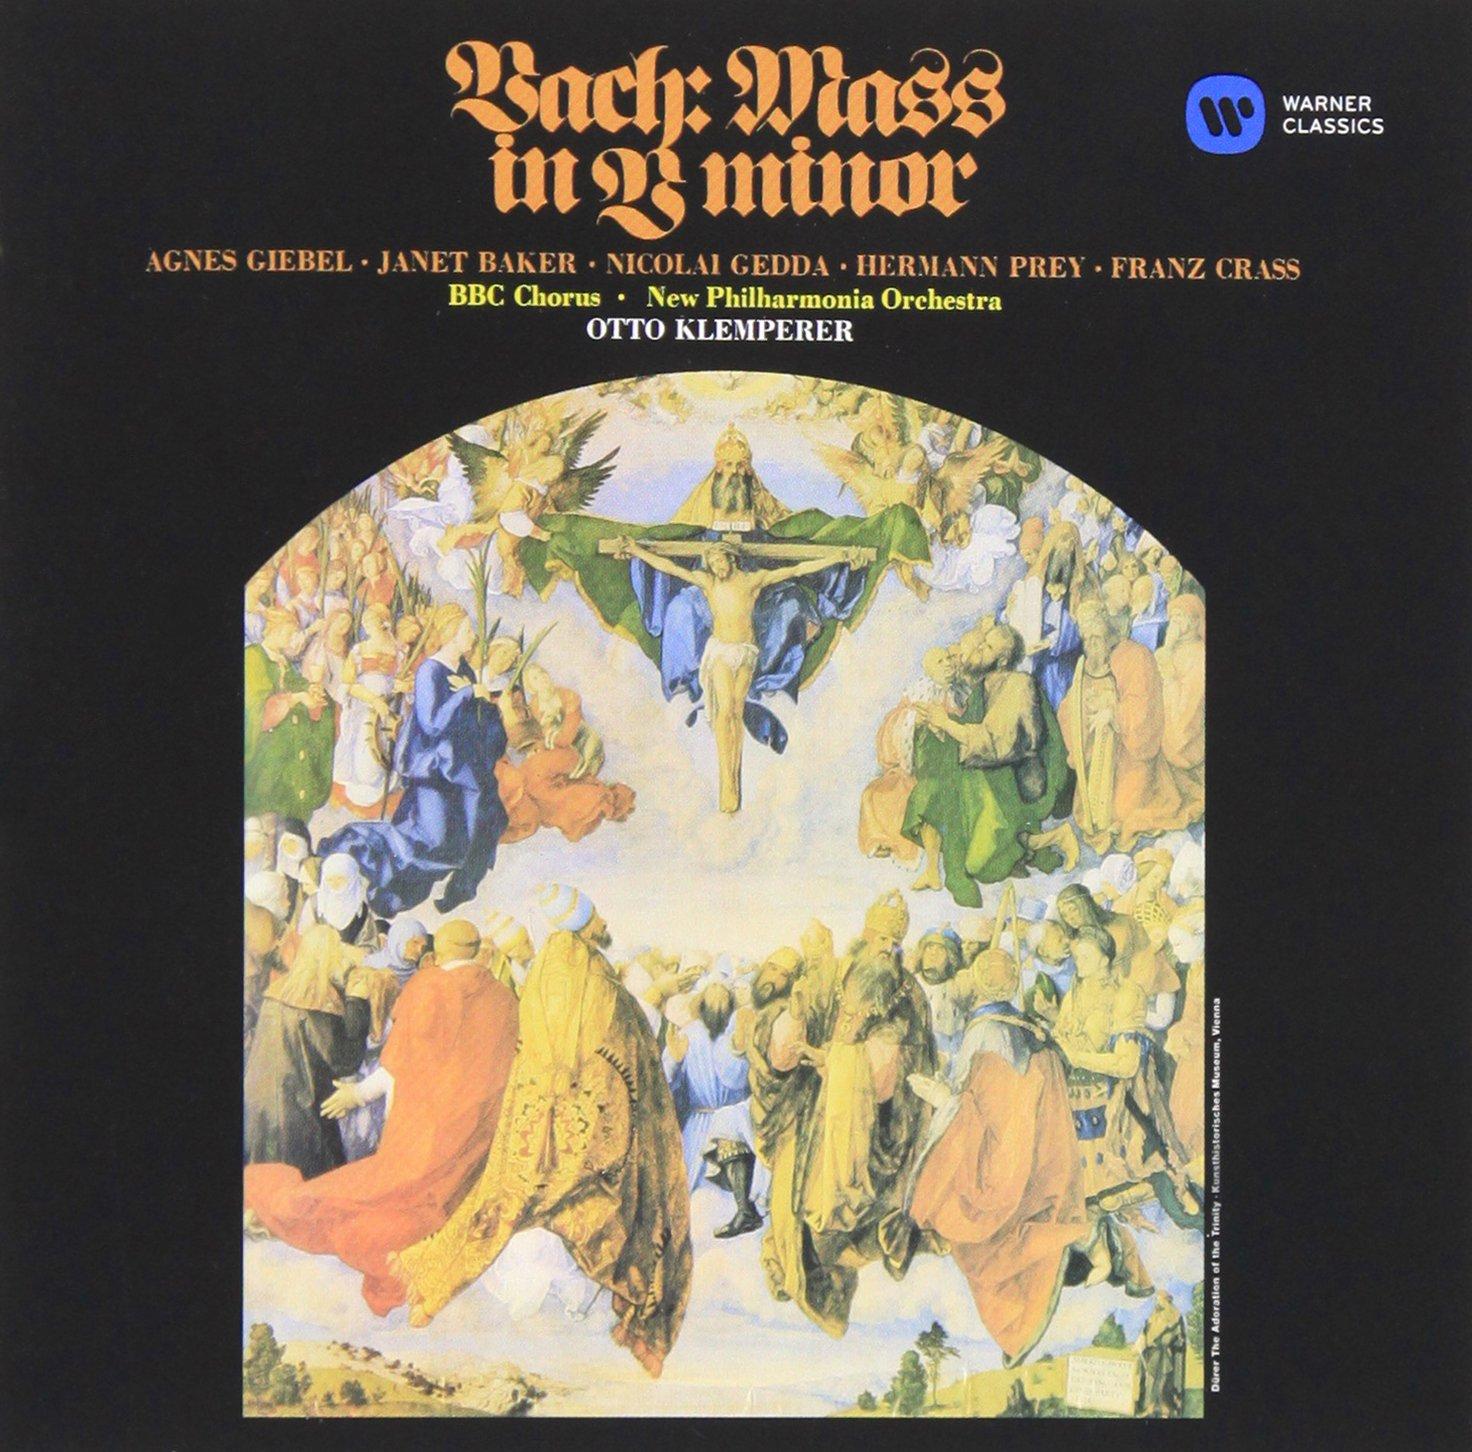 SACD : Otto Klemperer - J.s. Bach: Mass In B Minor (Japan - Import)